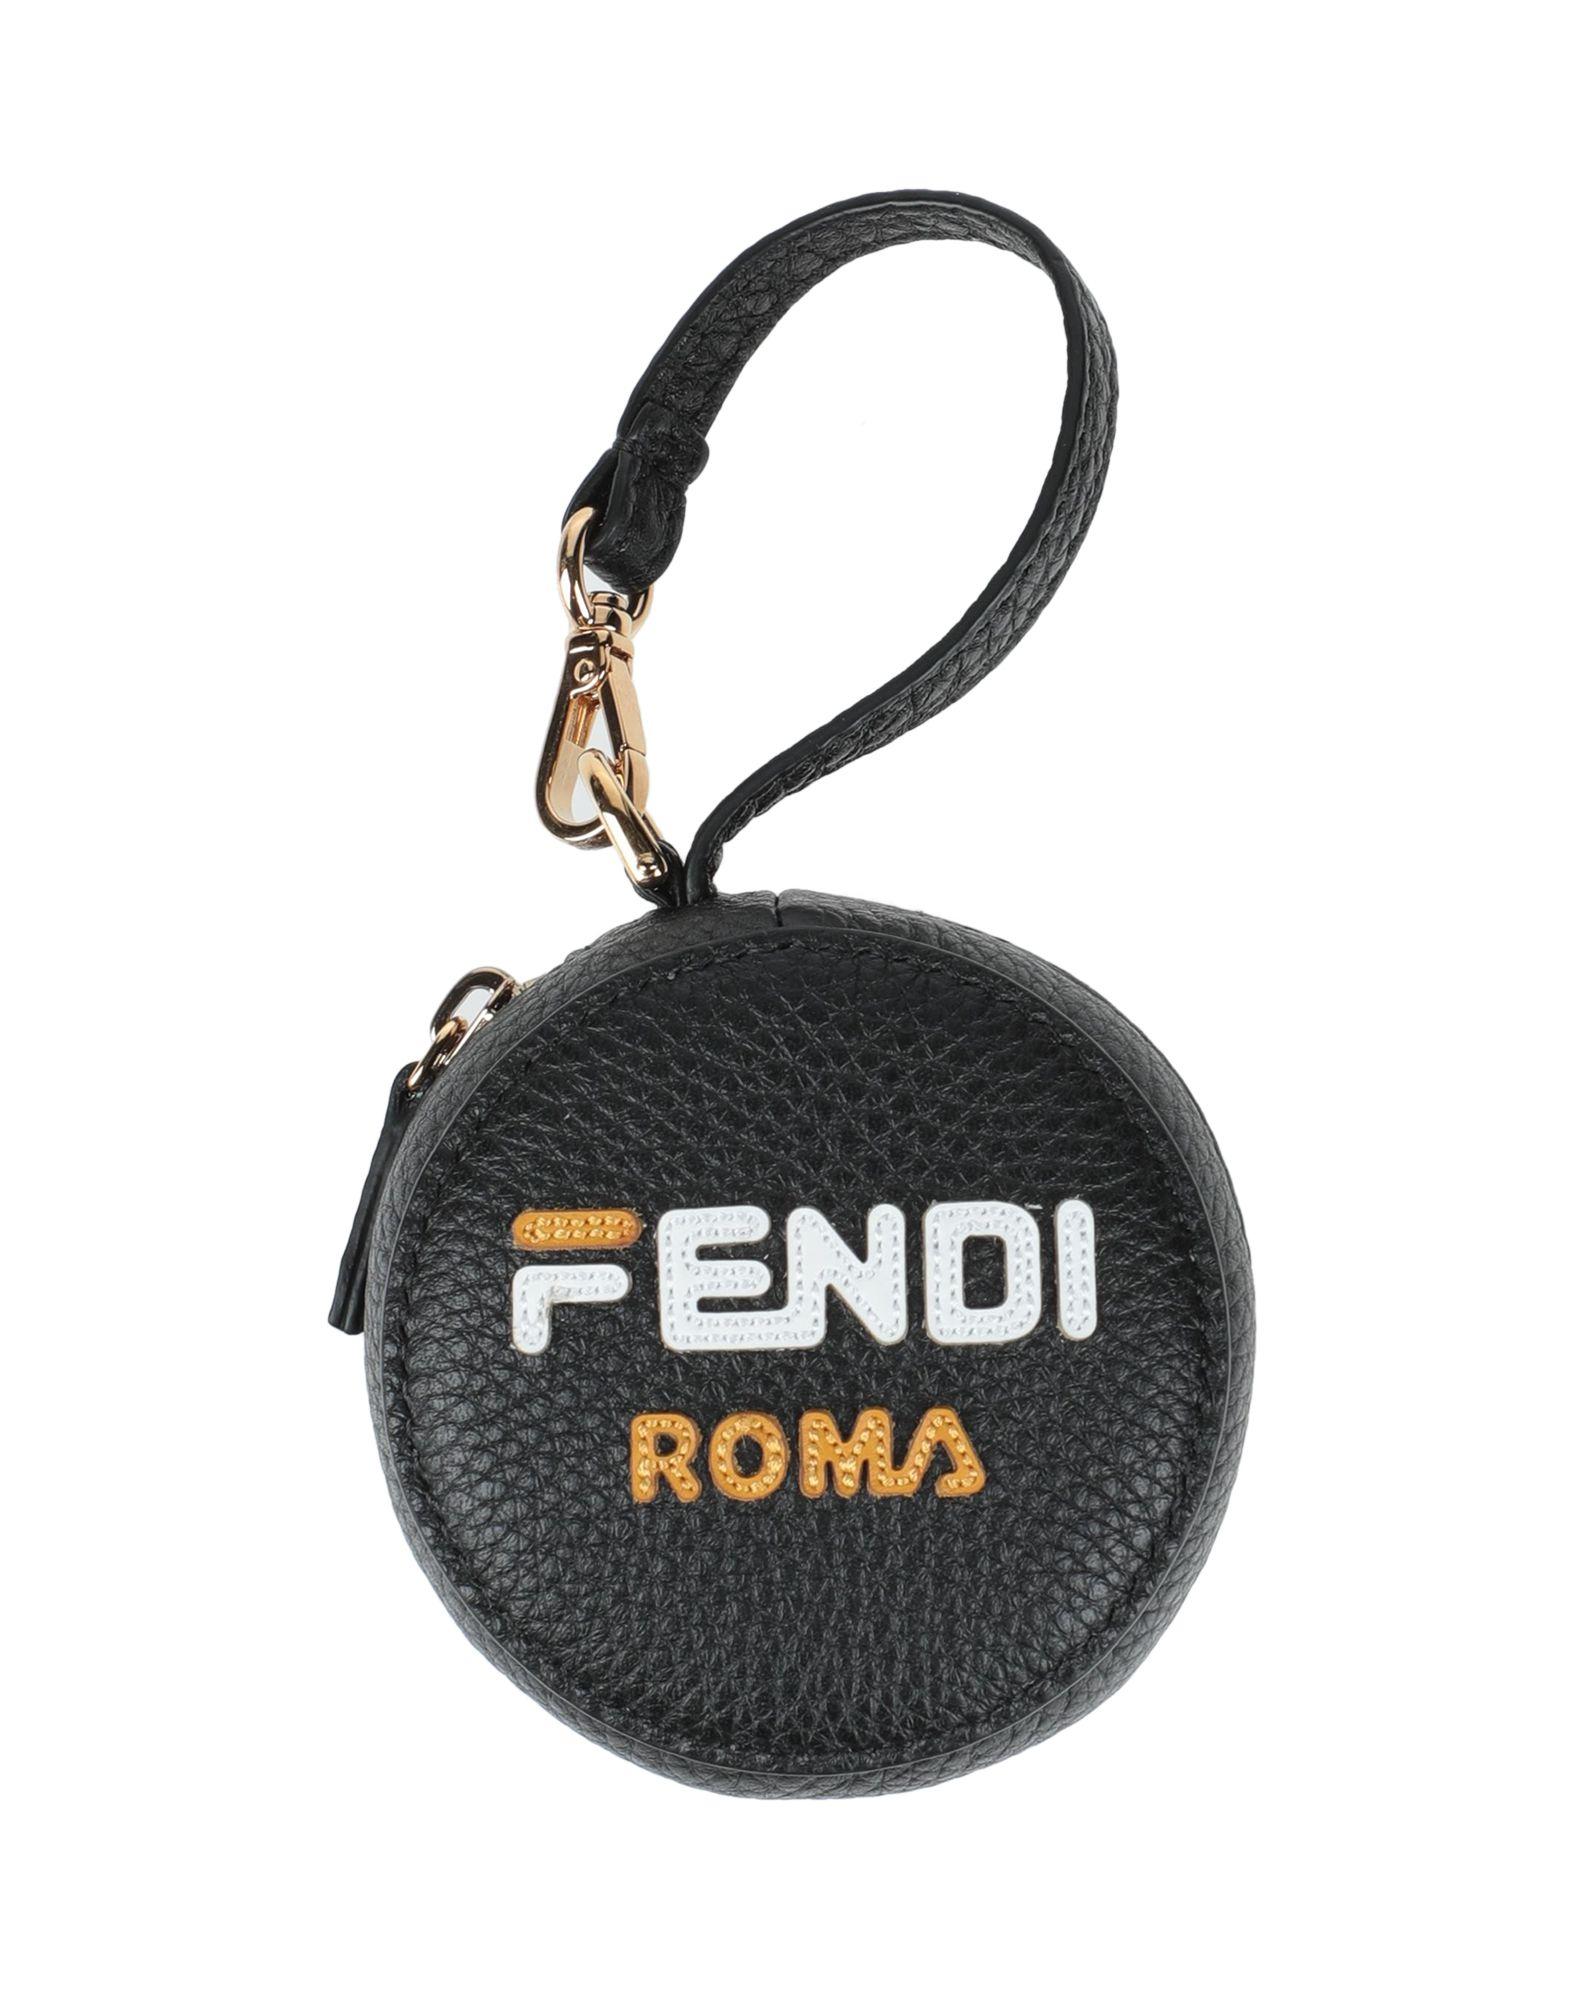 FENDI Кошелек для монет red tree design кожа pu откидной крышки кошелек карты держатель чехол для wiko slide 2